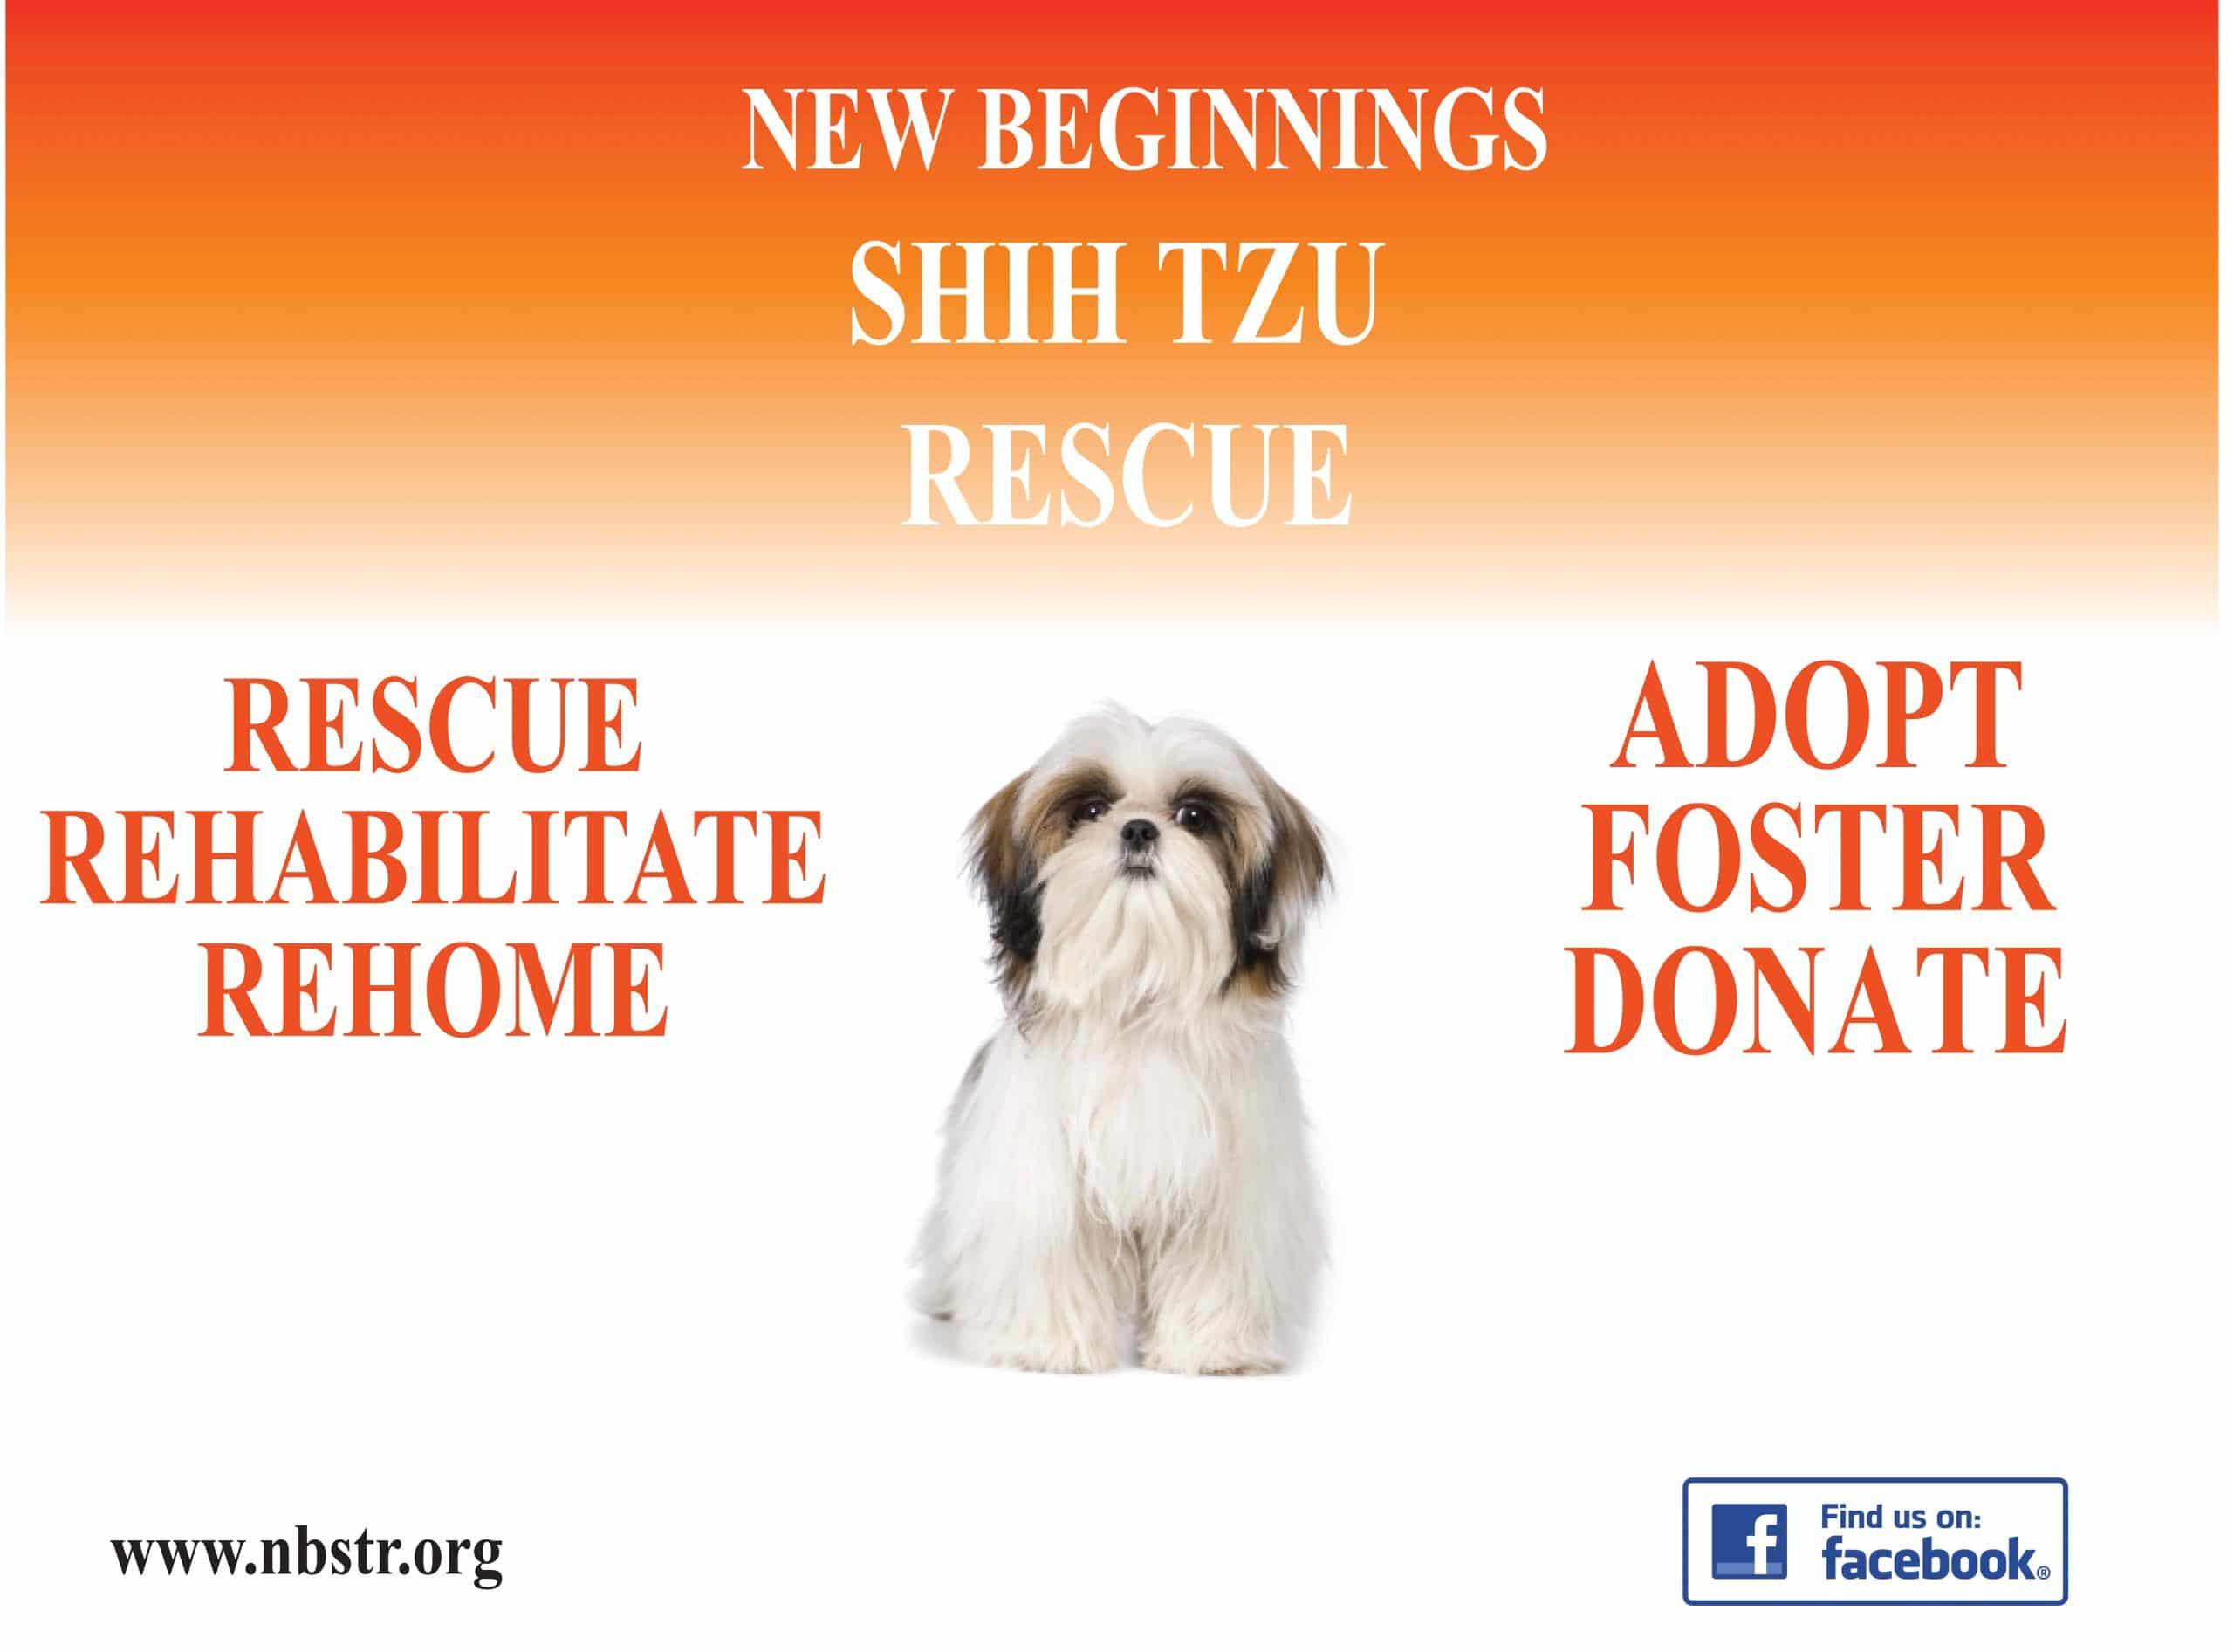 New Beginnings Shih Tzu Rescue